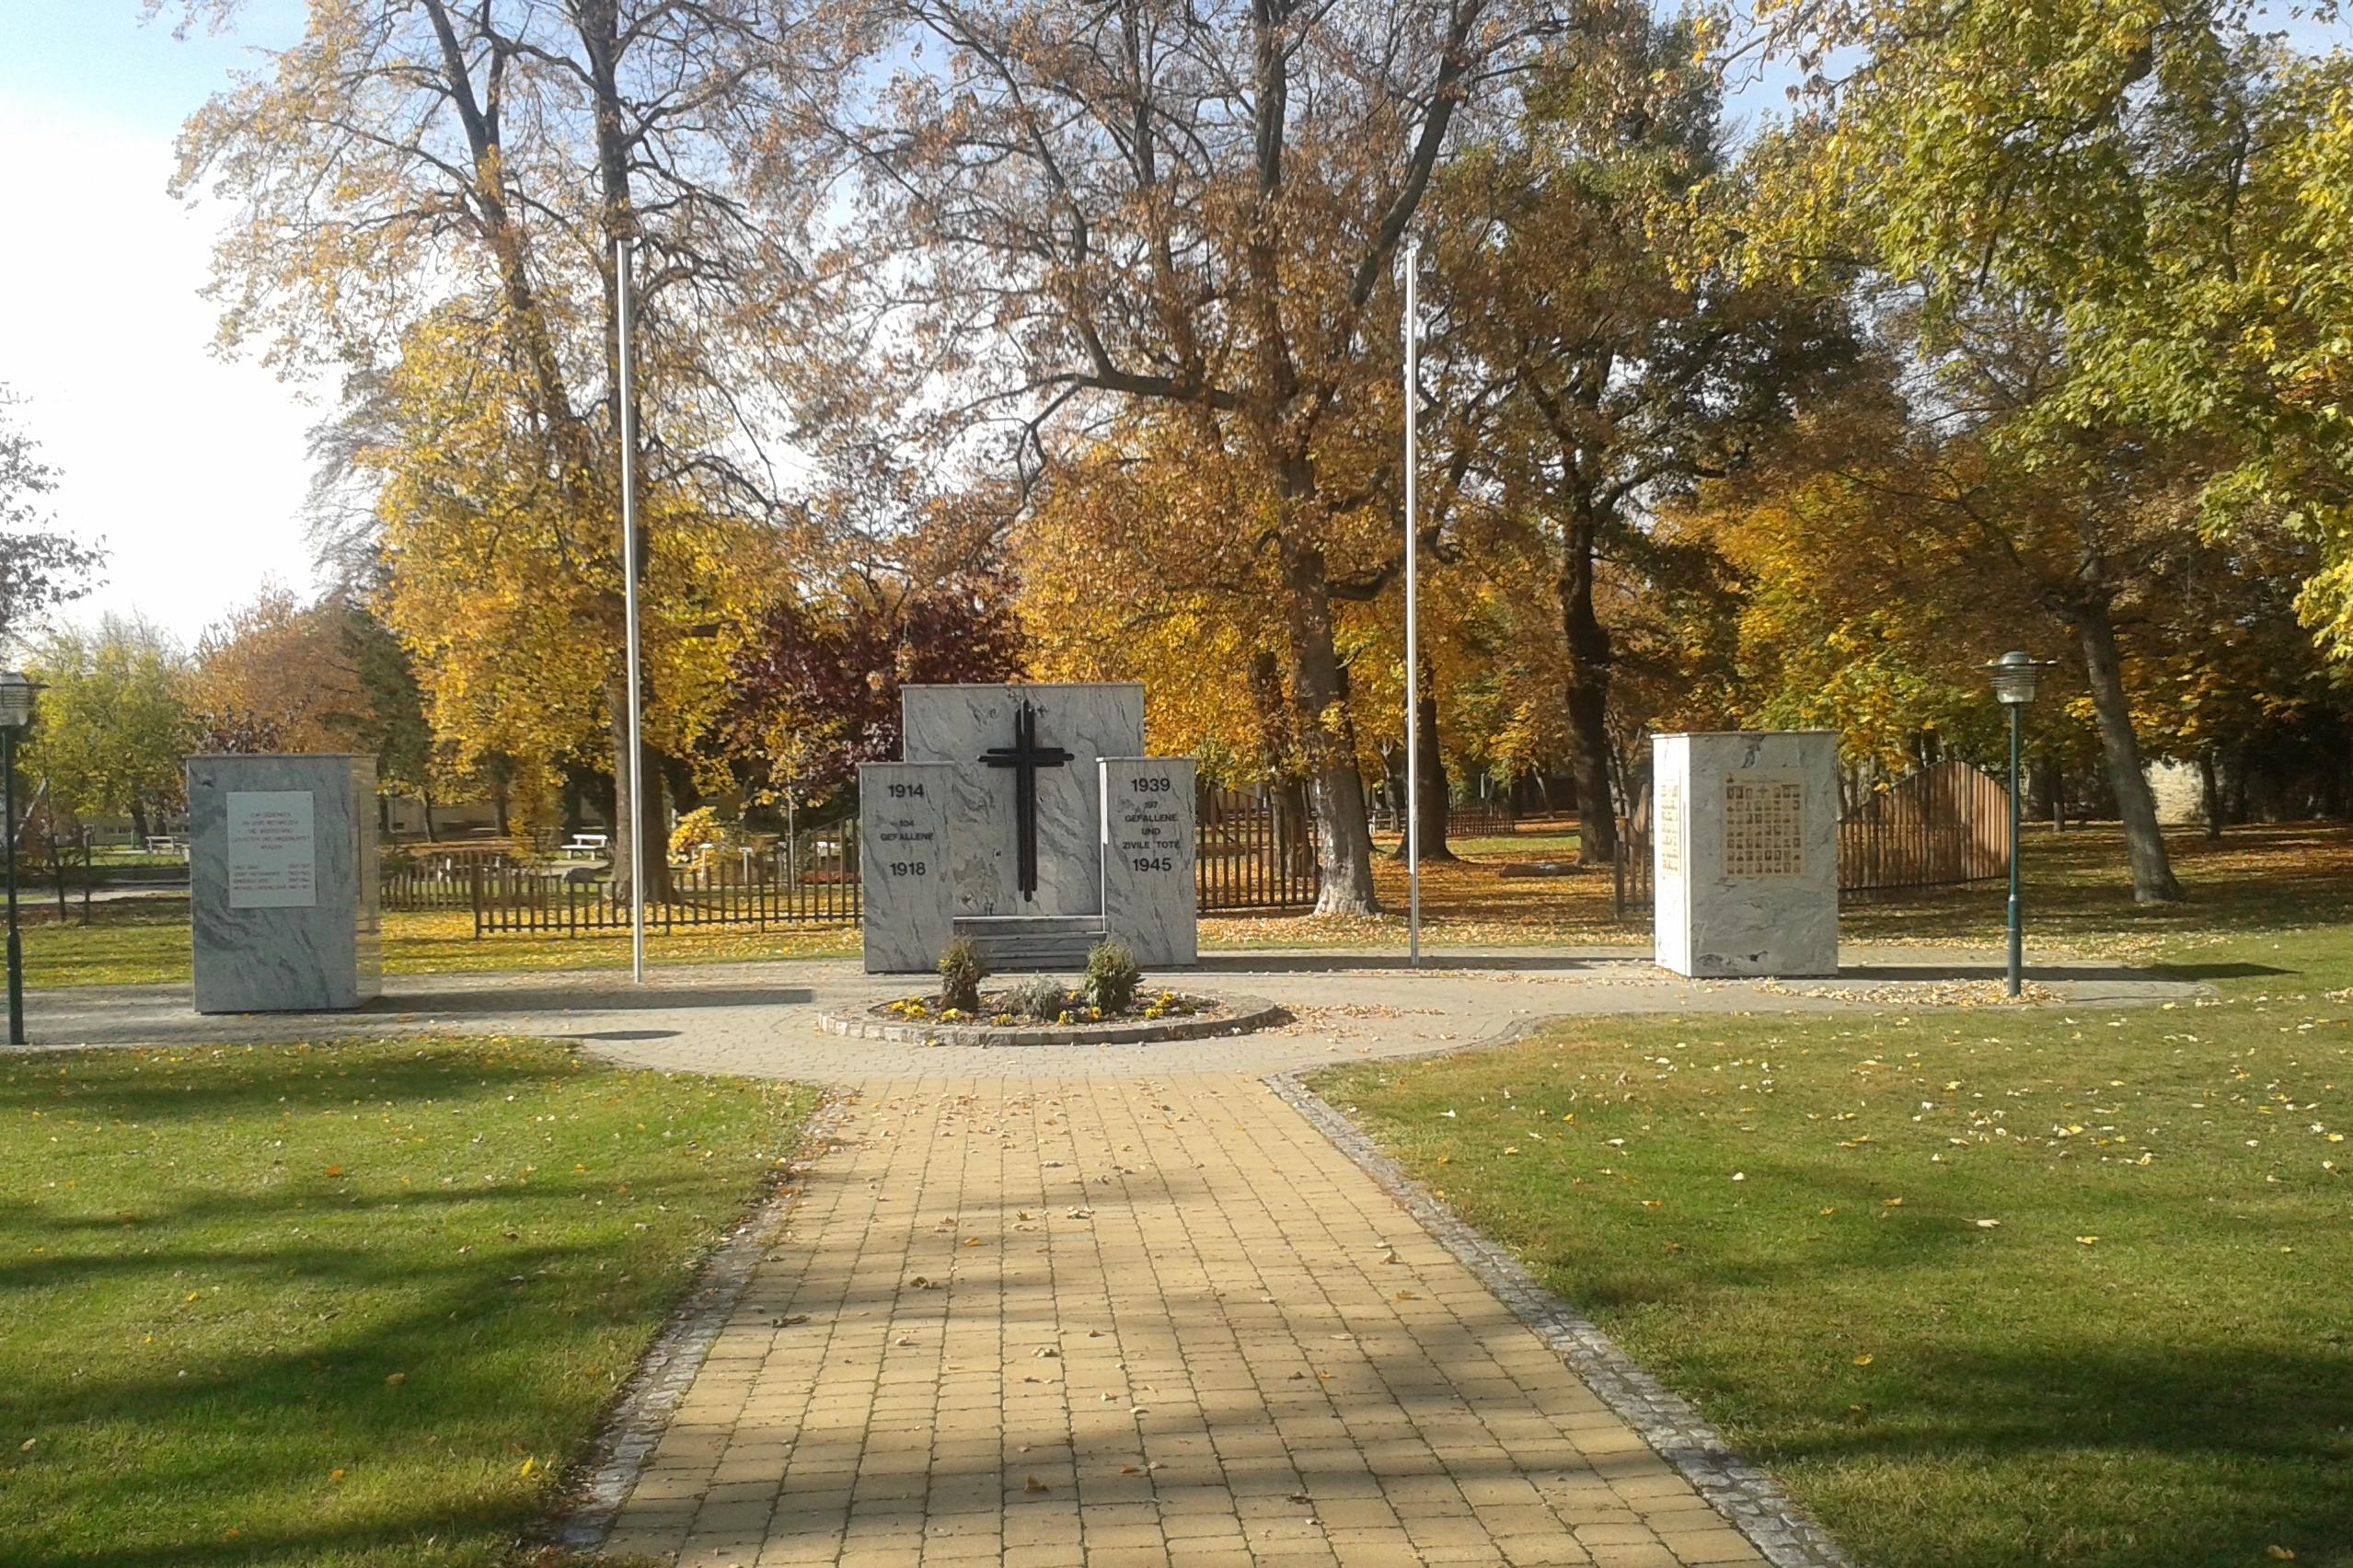 Friedensdenkmal in Rechnitz, Südburgenland